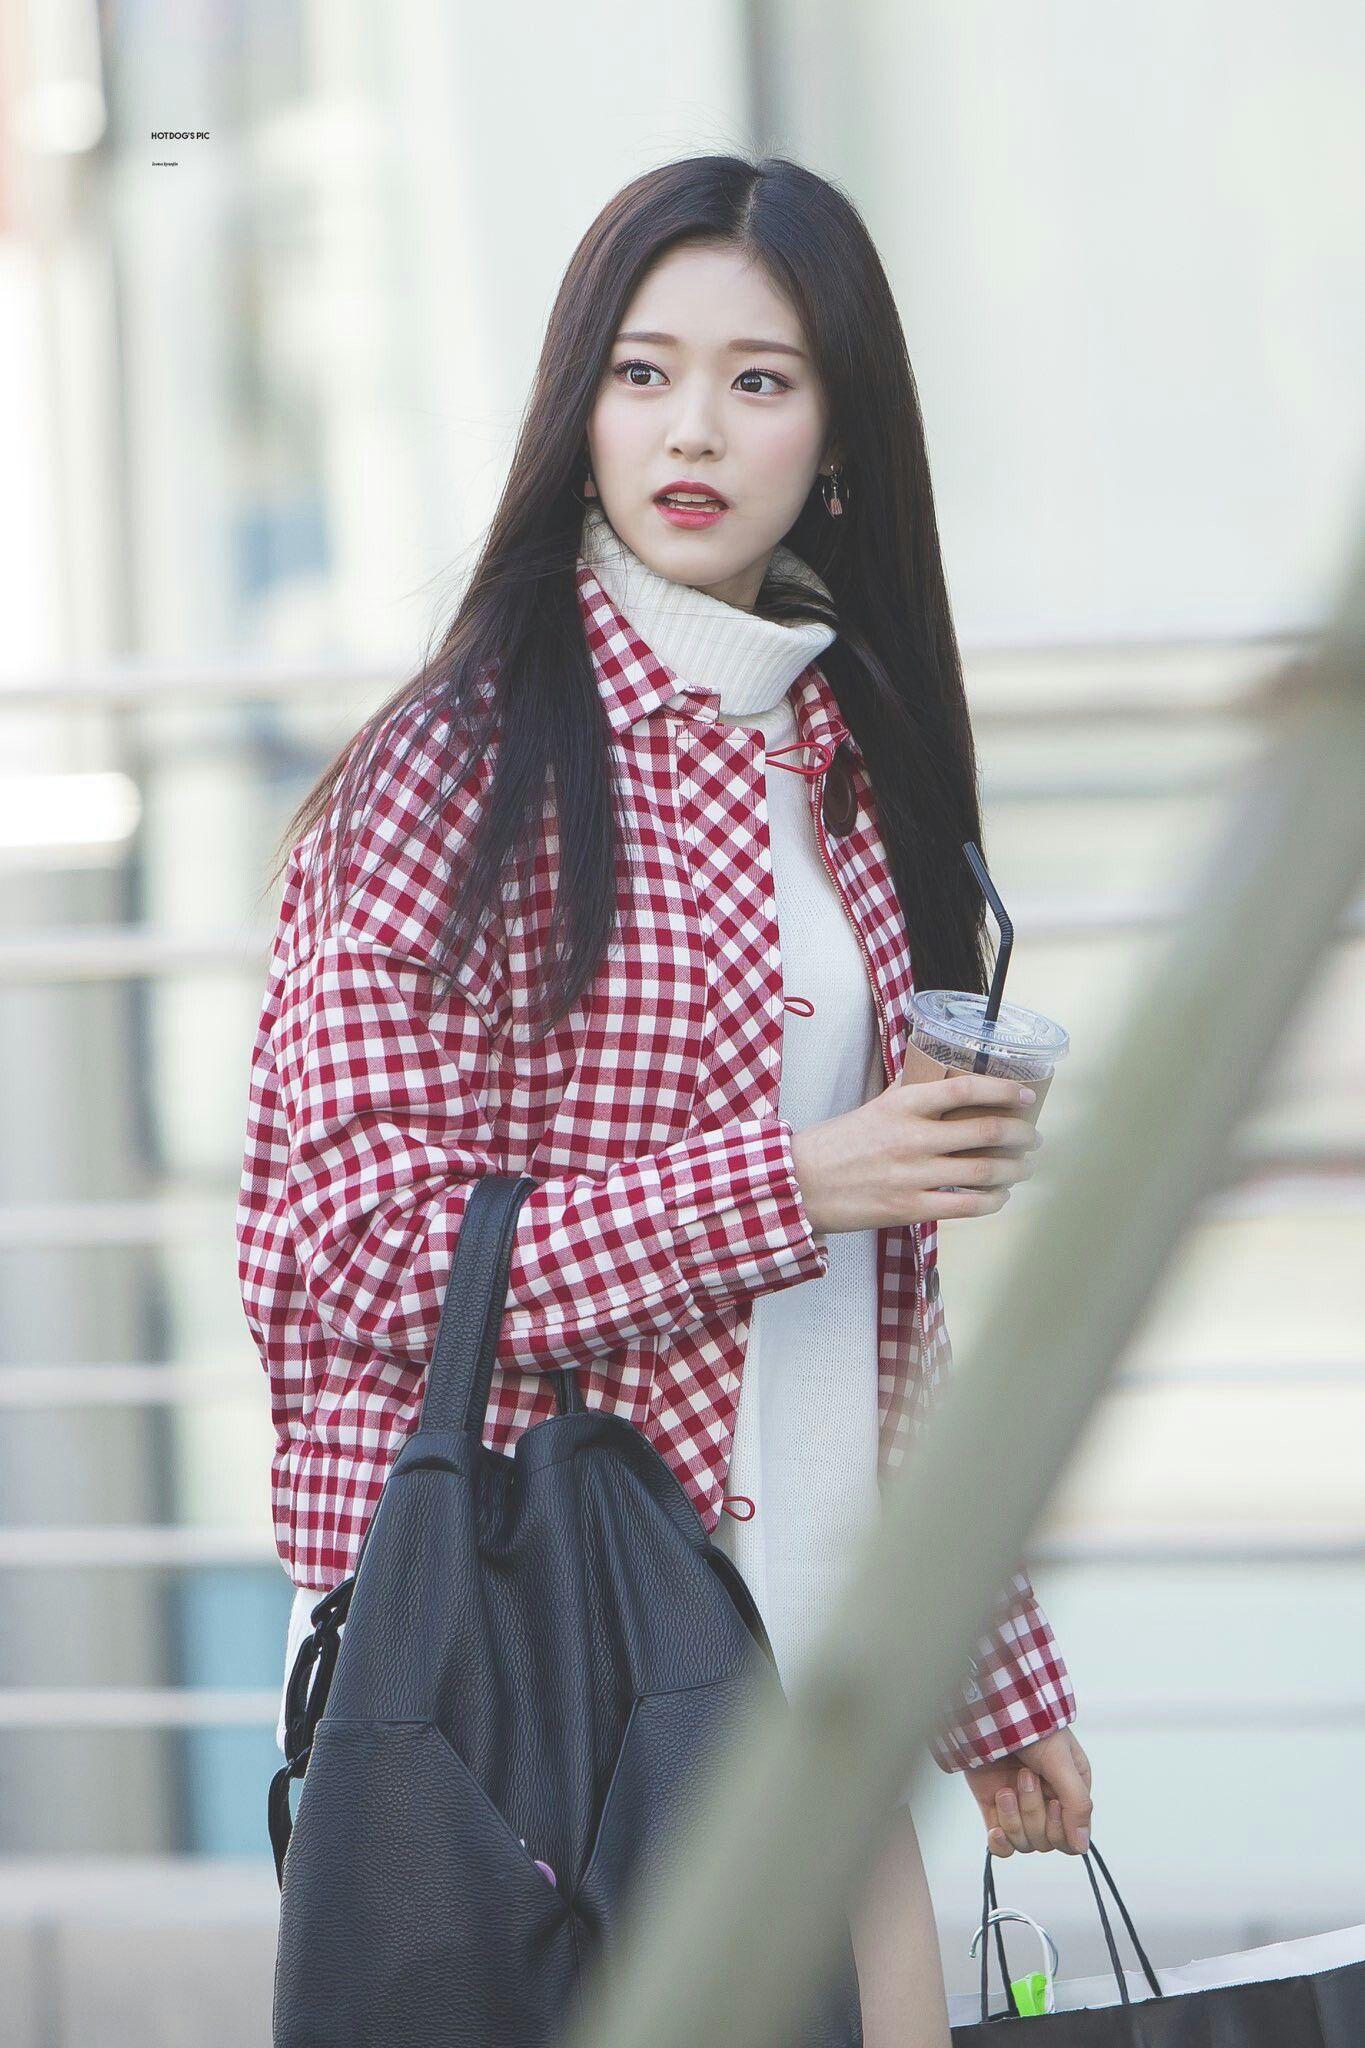 Loona - Hyunjin Naver x Dispatch 2018 - LOOΠΔ Photo